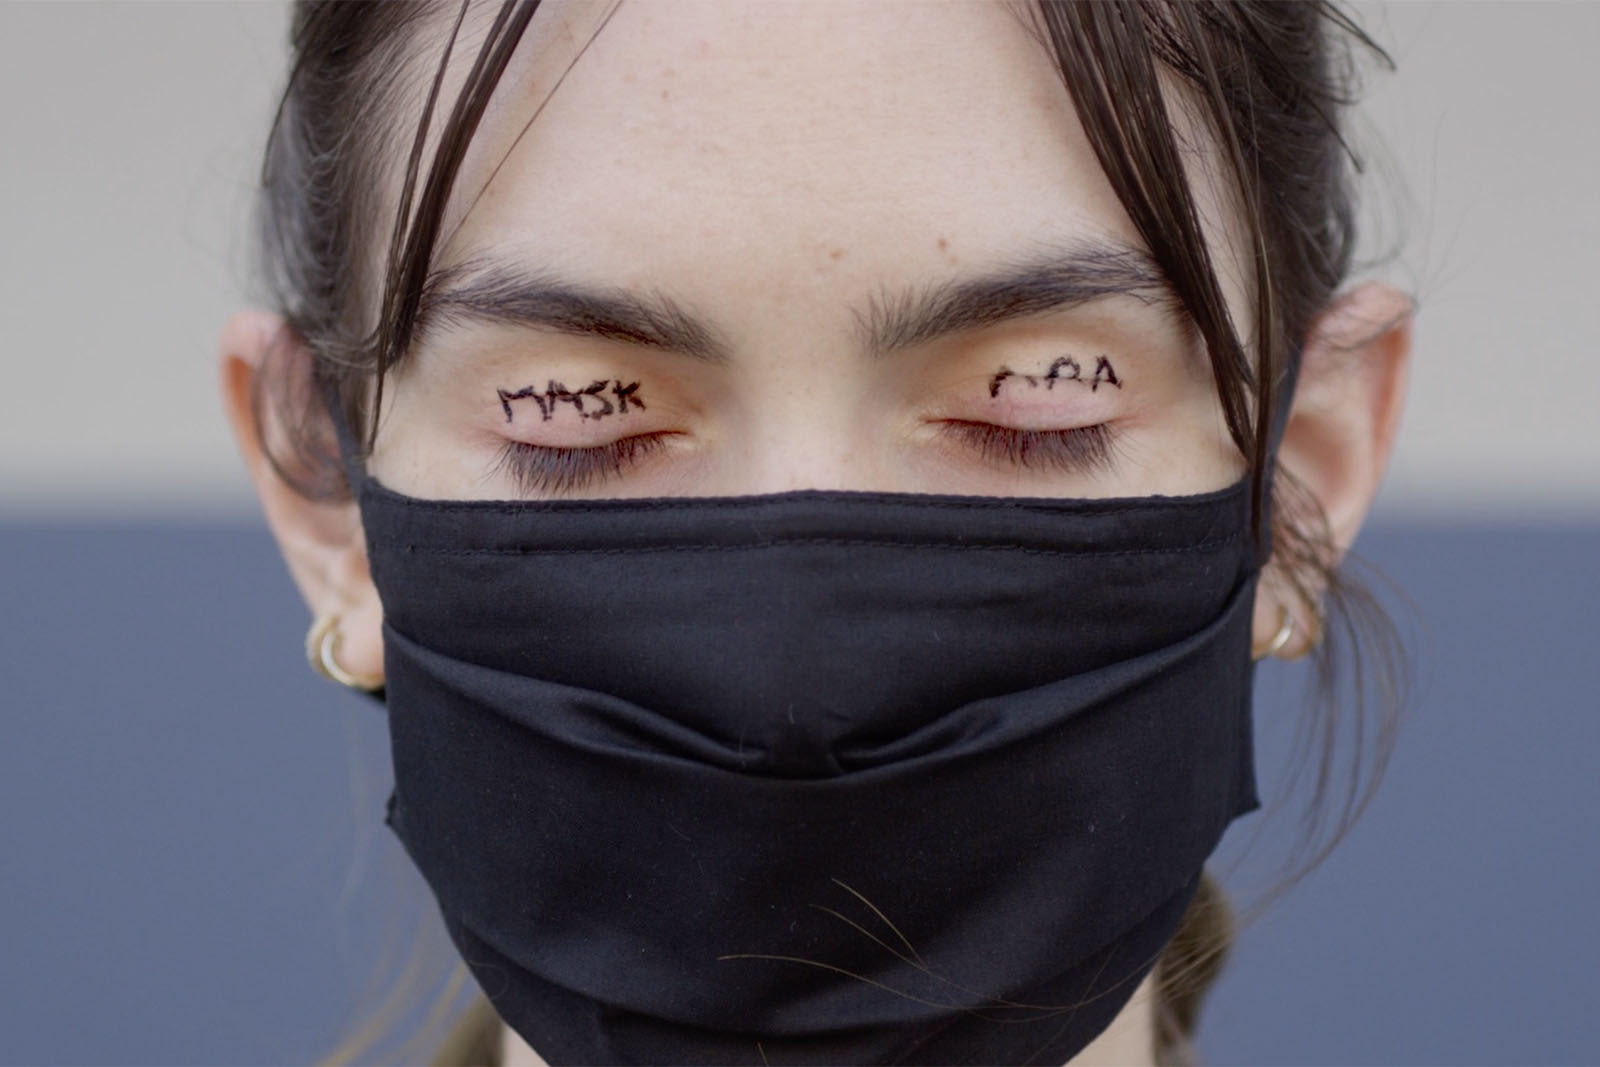 Mask + Mascara = MASKARA